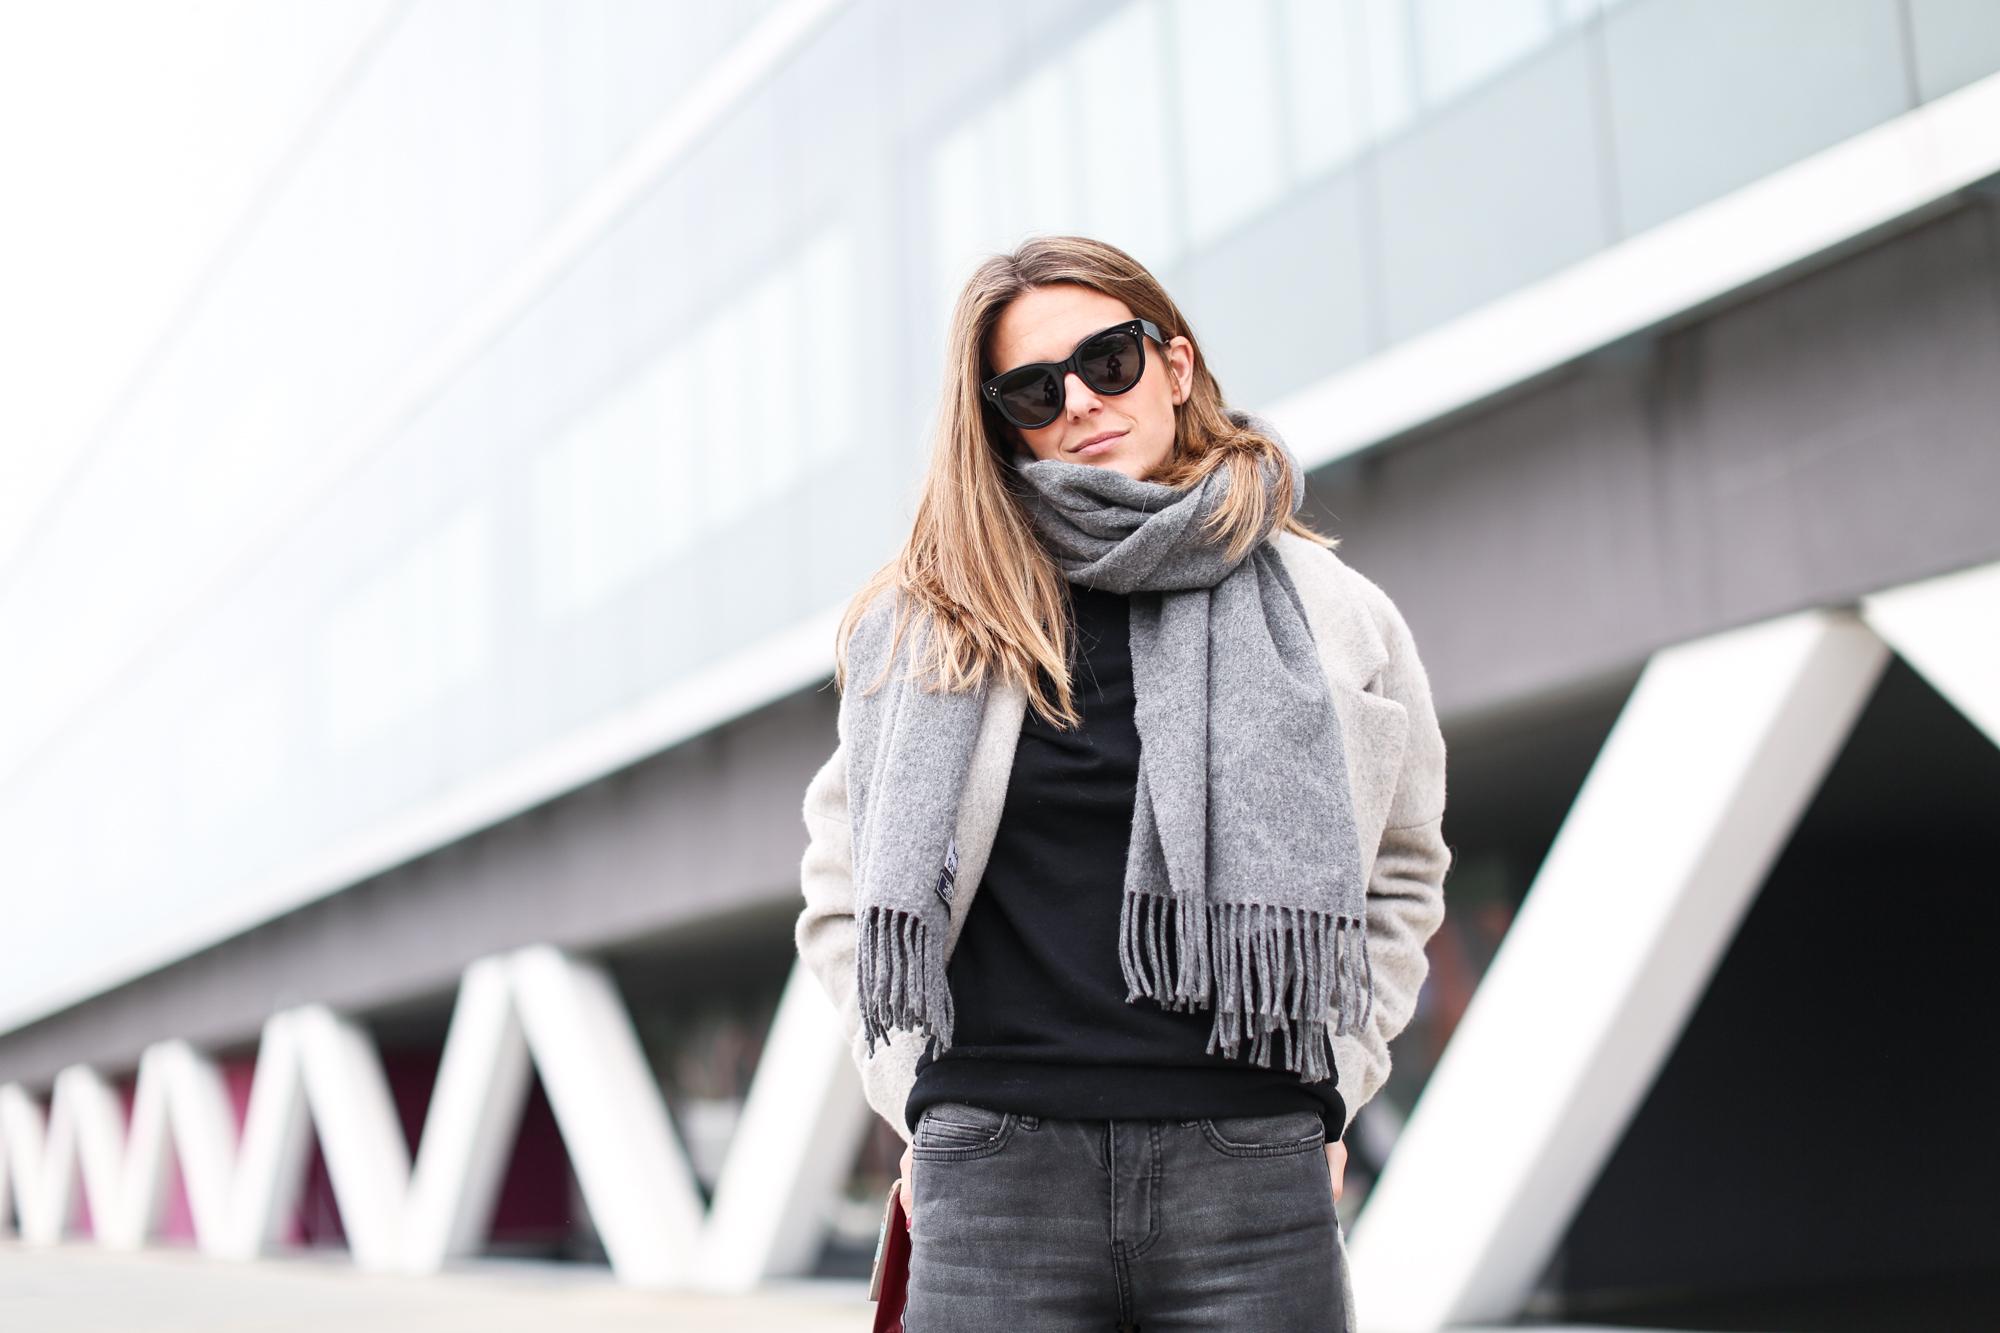 Clochet_streetstyle_fashionblogger_abrigolargogrislanamango_isabelmarantdicker_sudaderalazoclaudiepierlot-4